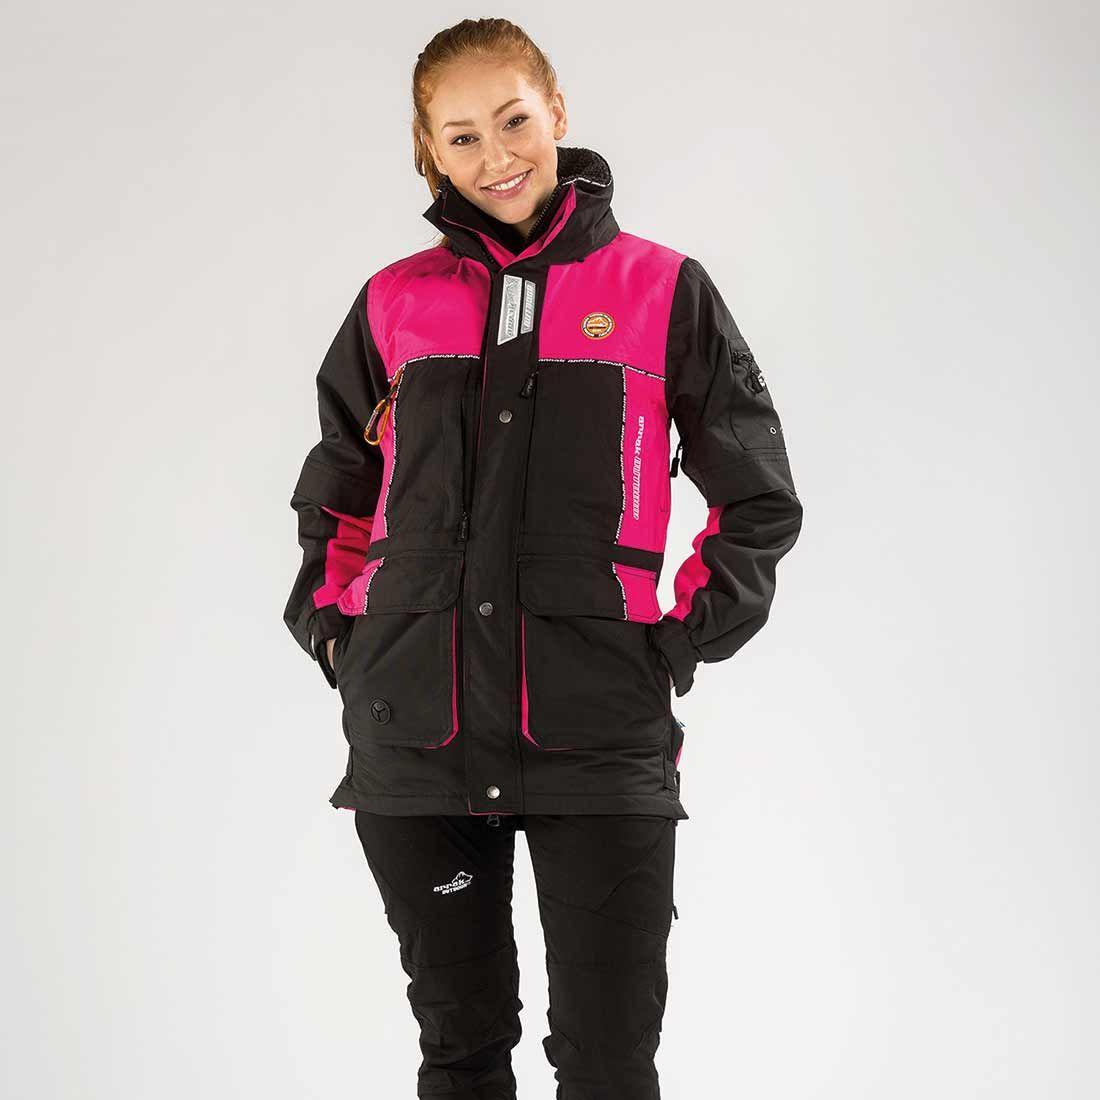 Arrak New Original Jacket Pink/Black XL